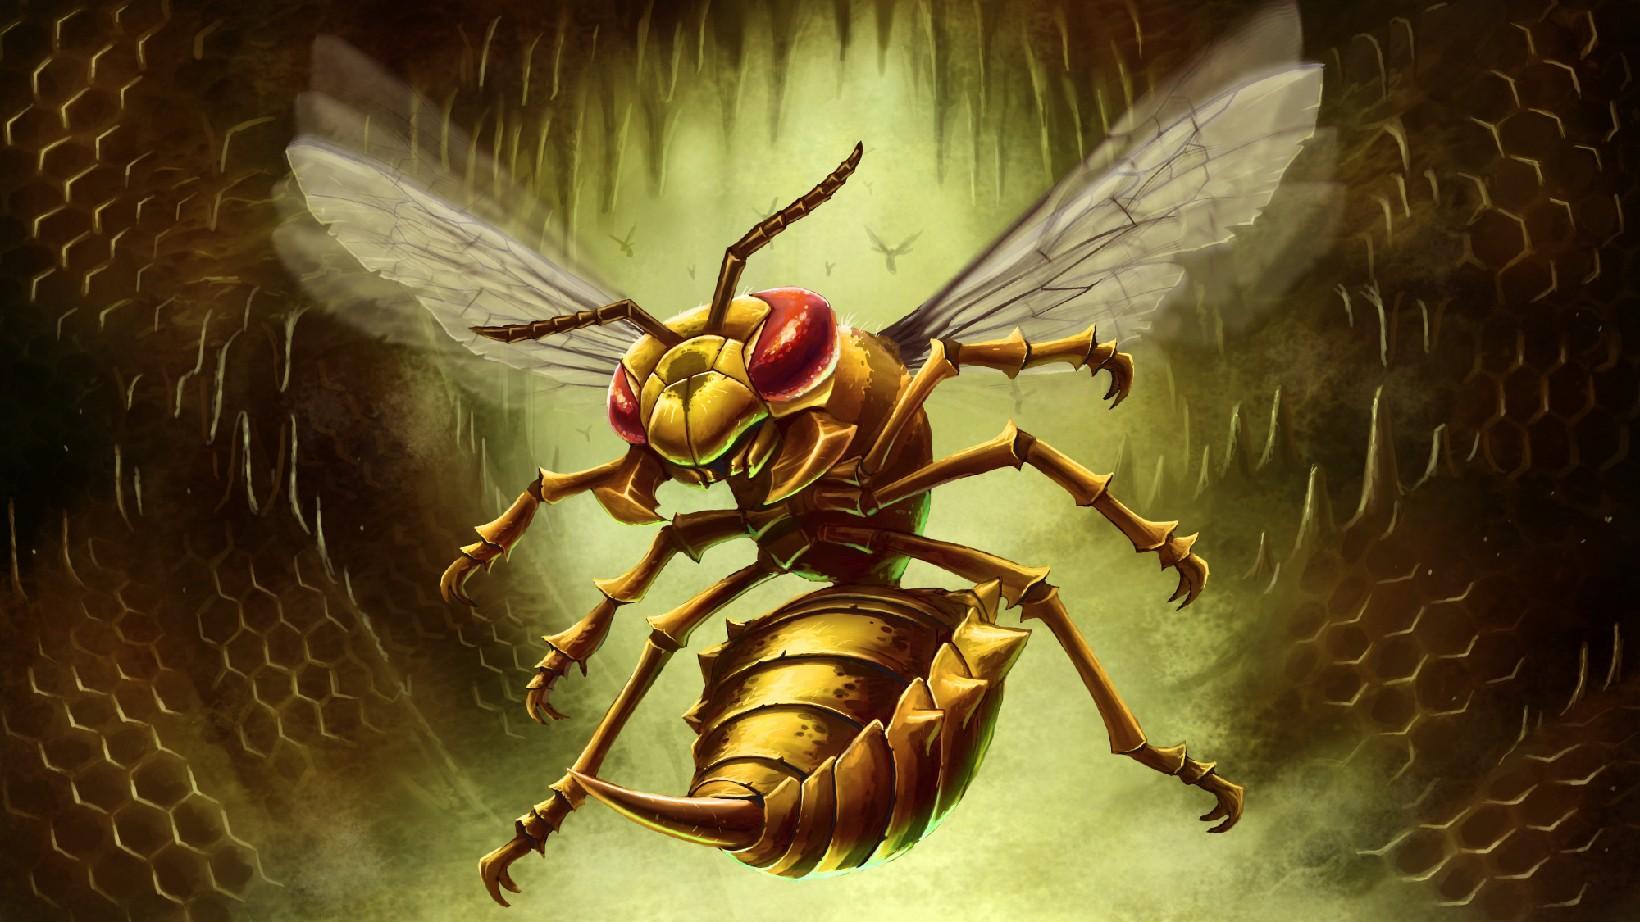 WASP - game character